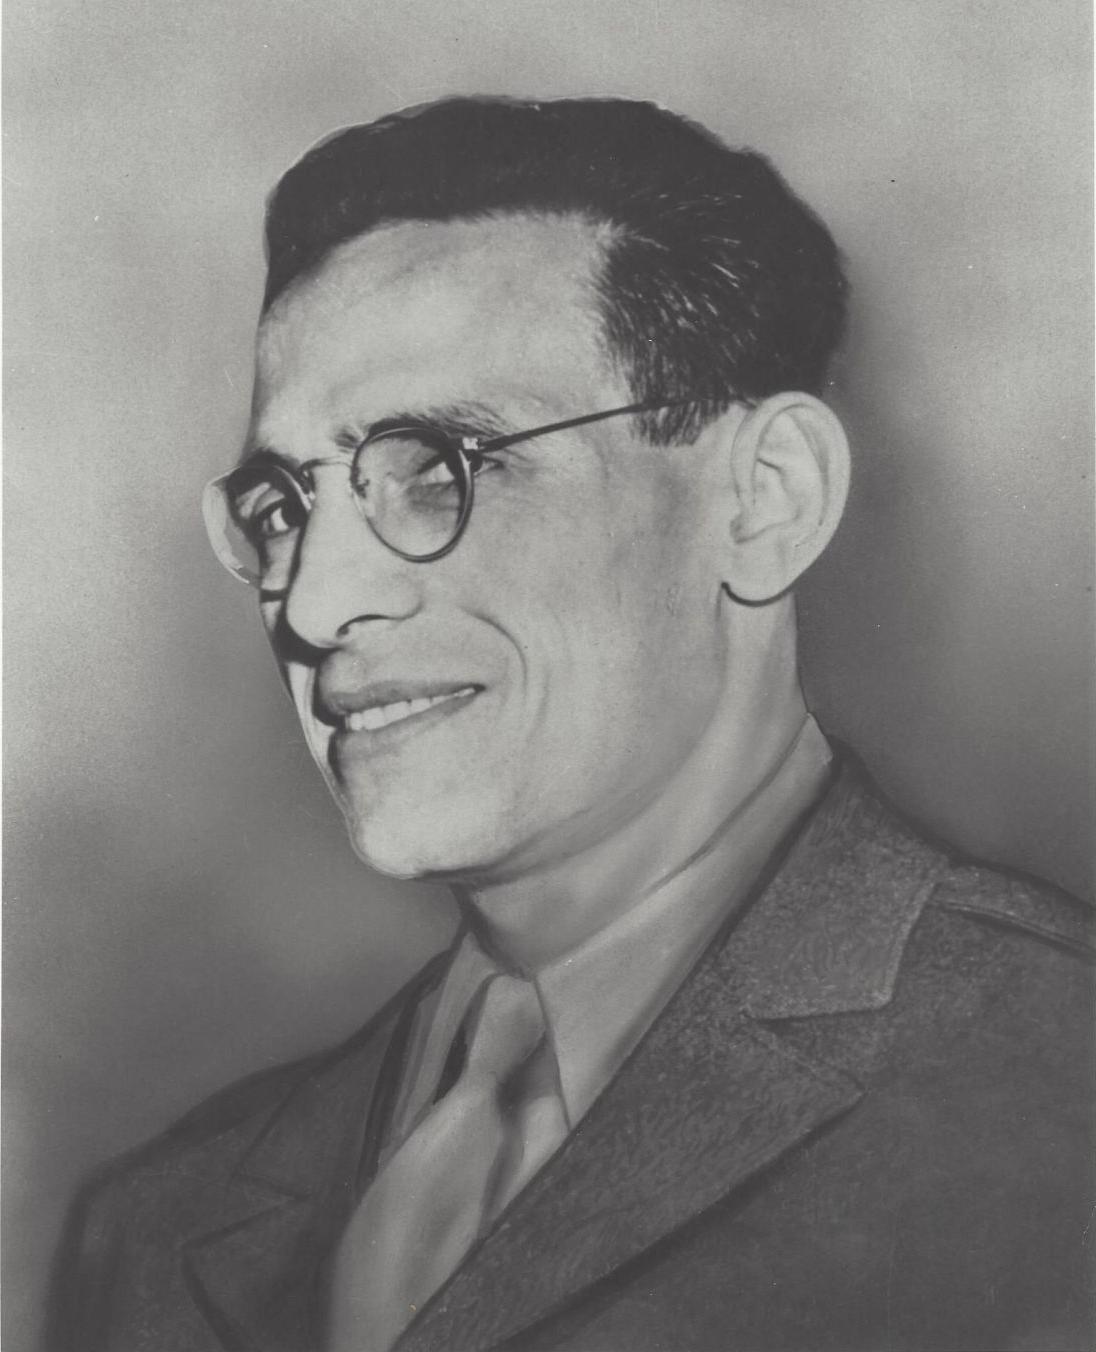 Vito Bertoldo